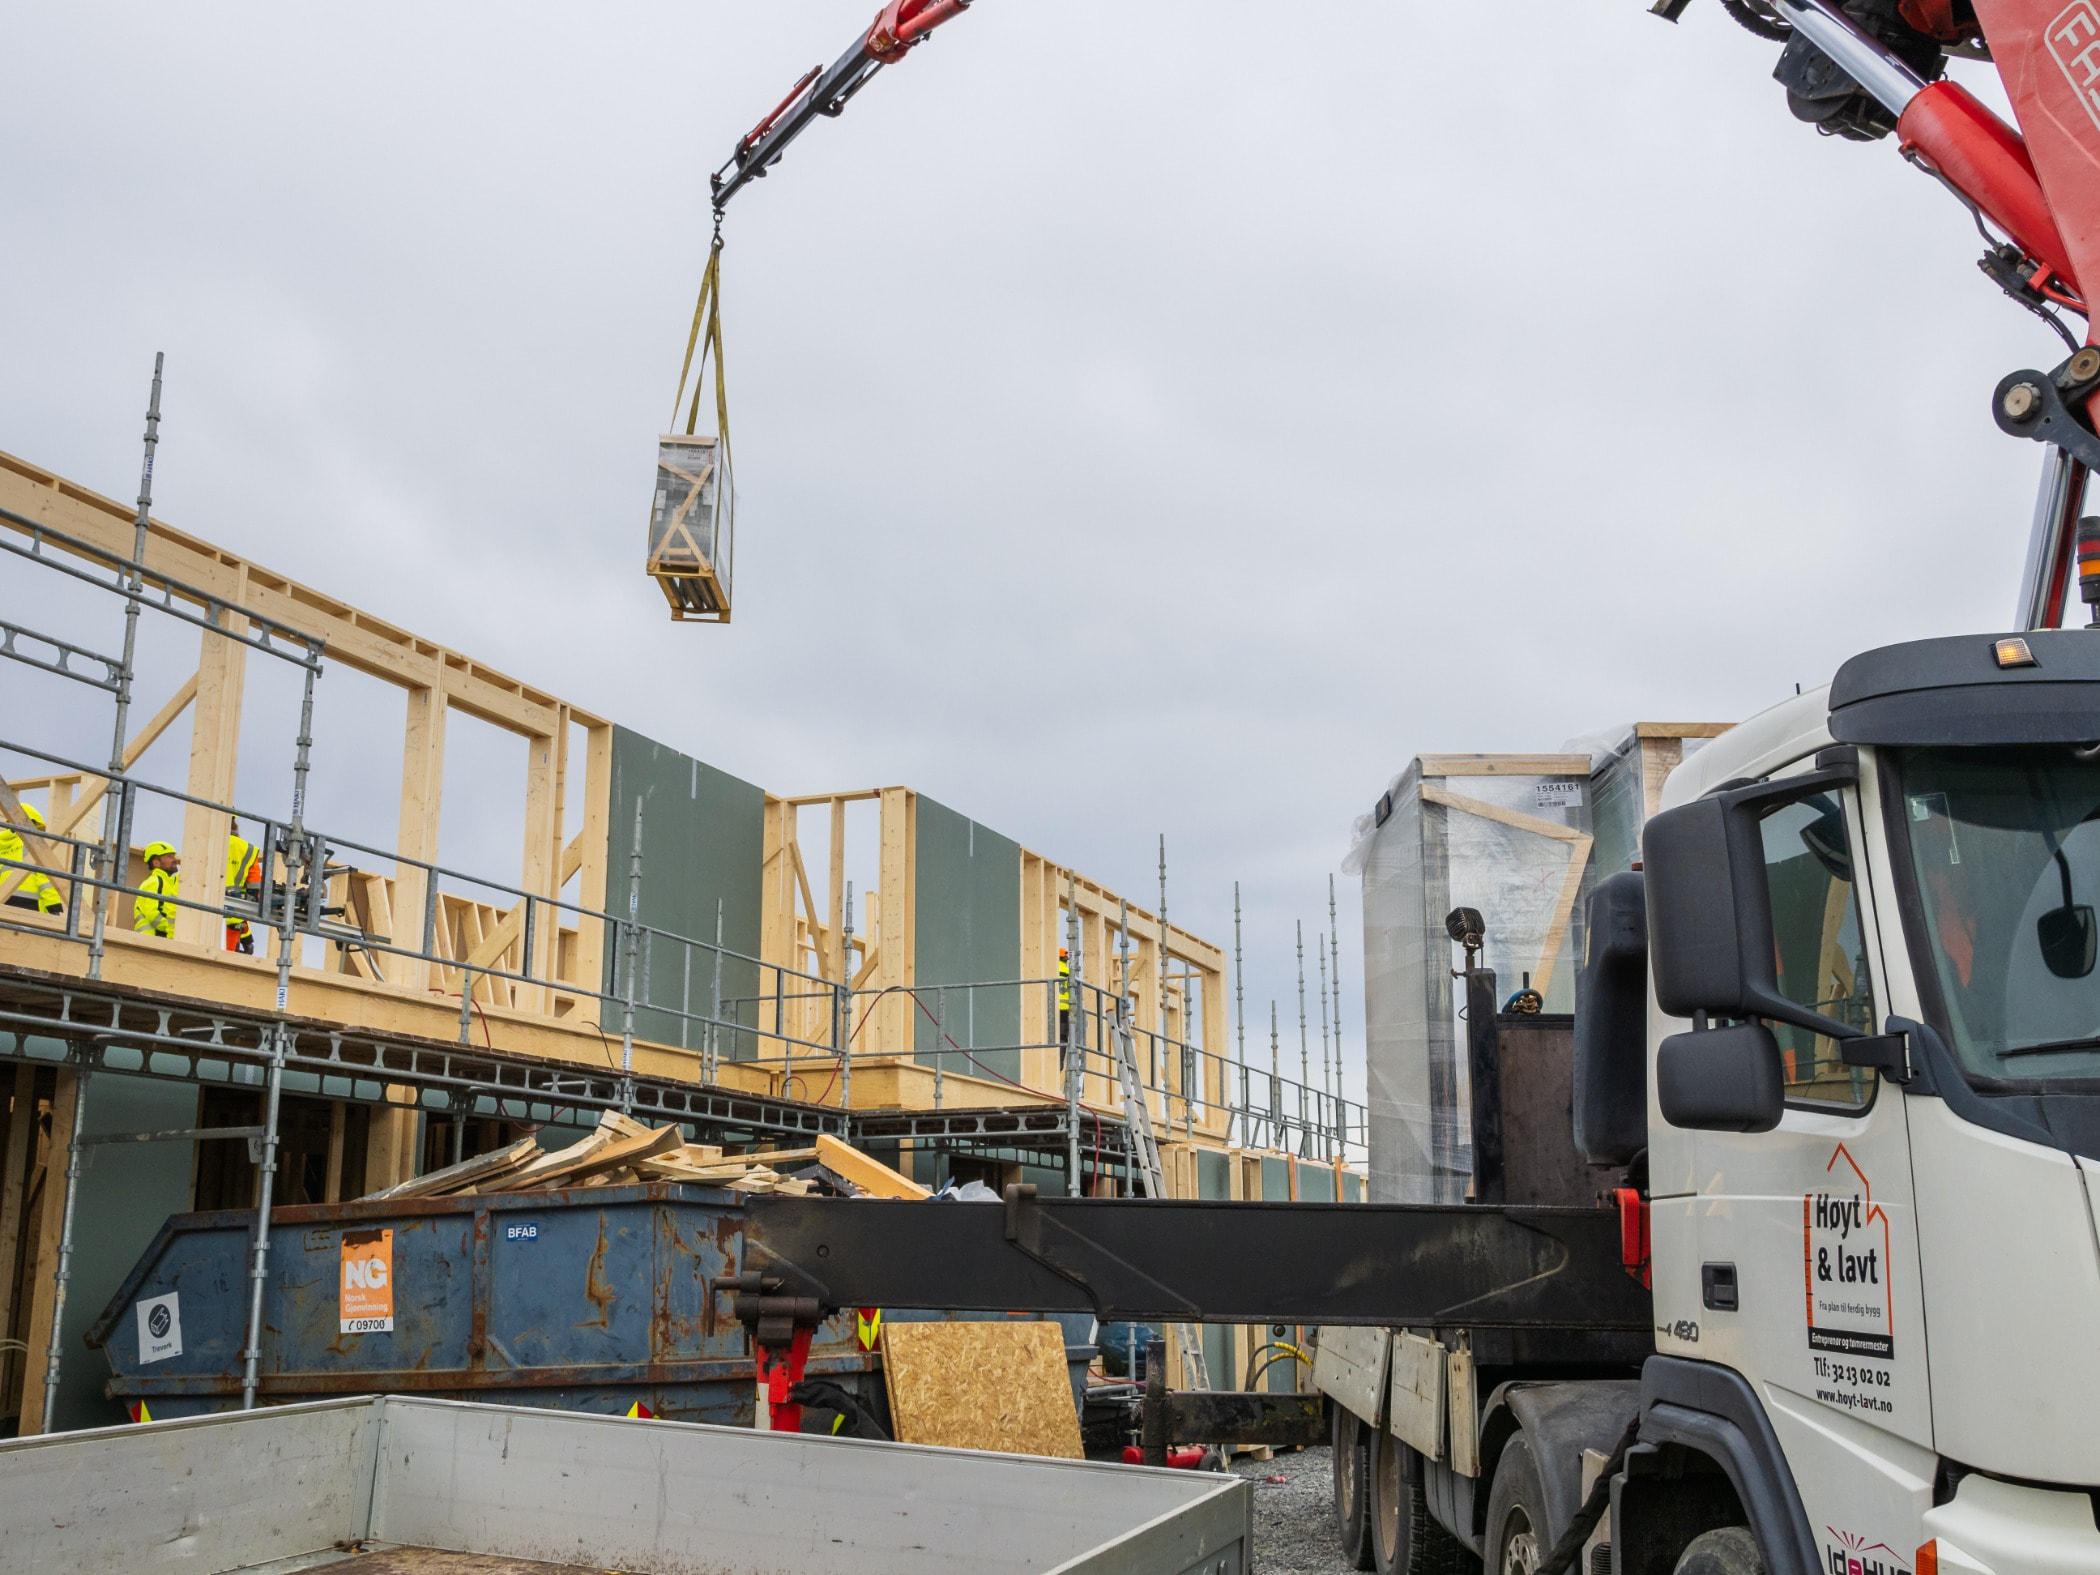 Mode of transport, Construction equipment, Vehicle, Crane